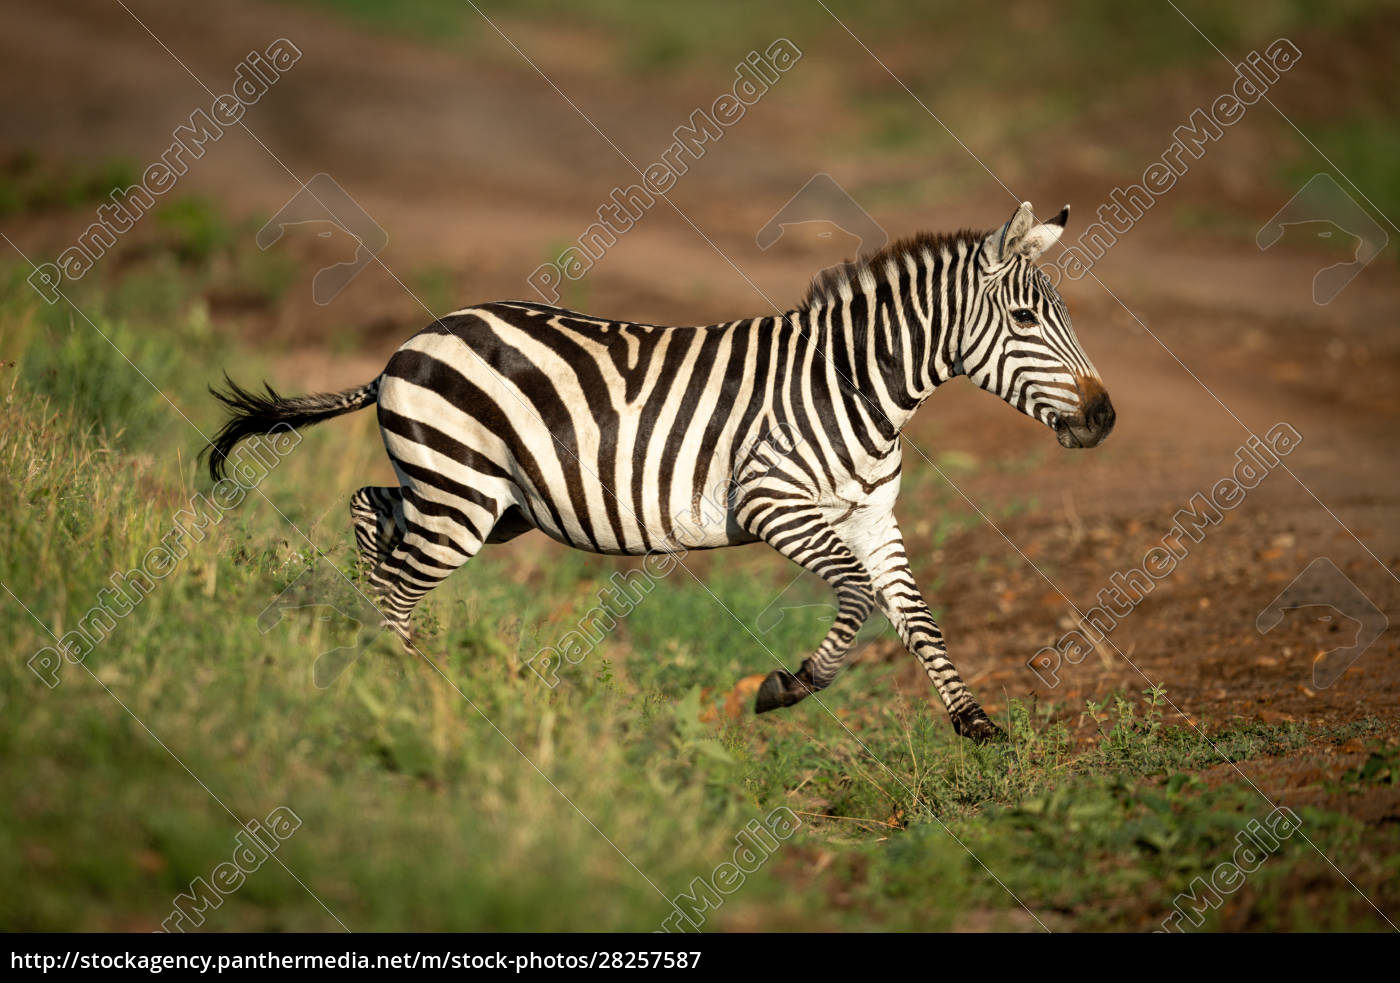 plains, zebra, jumps, over, ditch, onto - 28257587